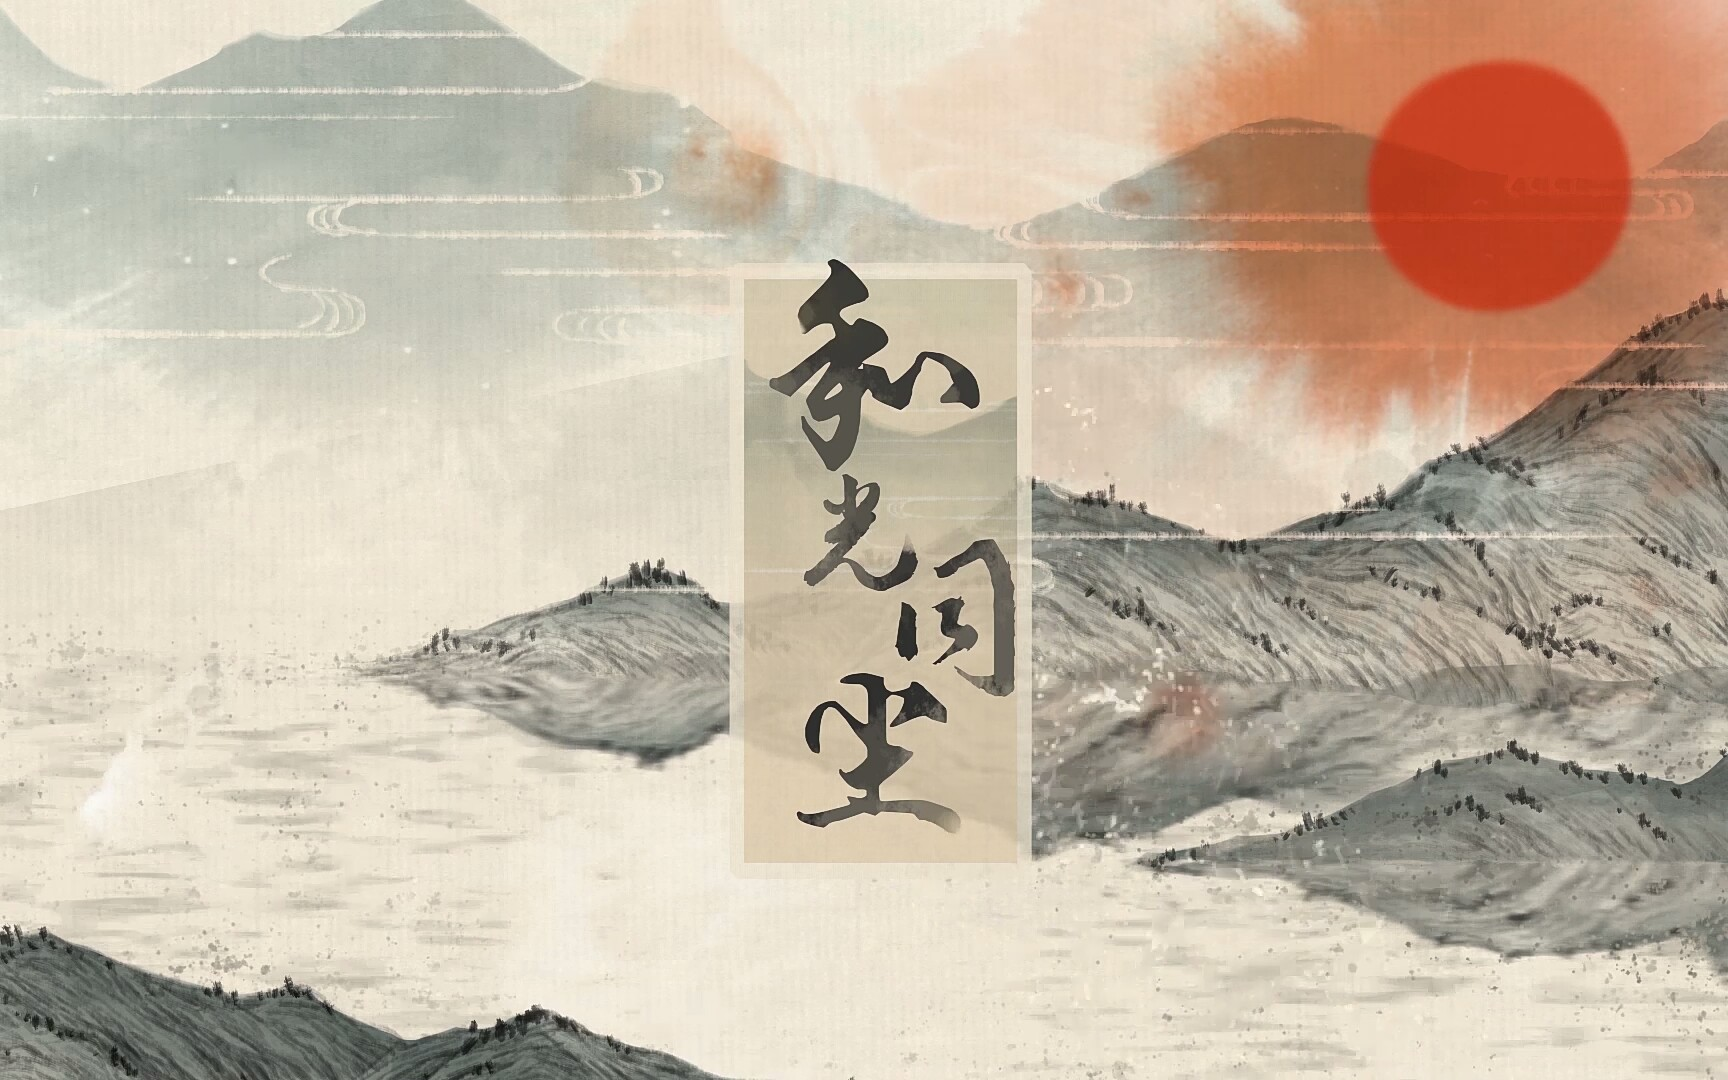 和光同尘 (Hé Guāng Tóng Chén)